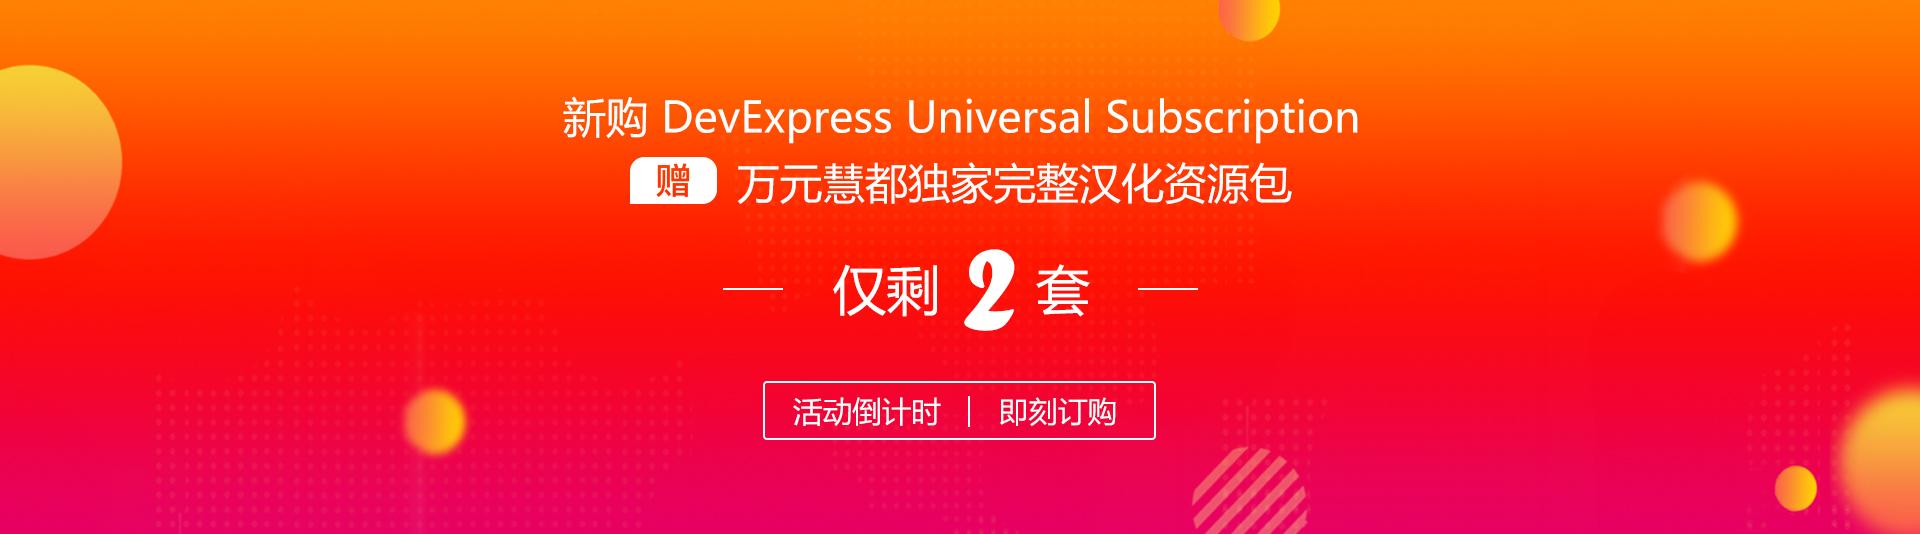 DevExpress万元汉化包免费送